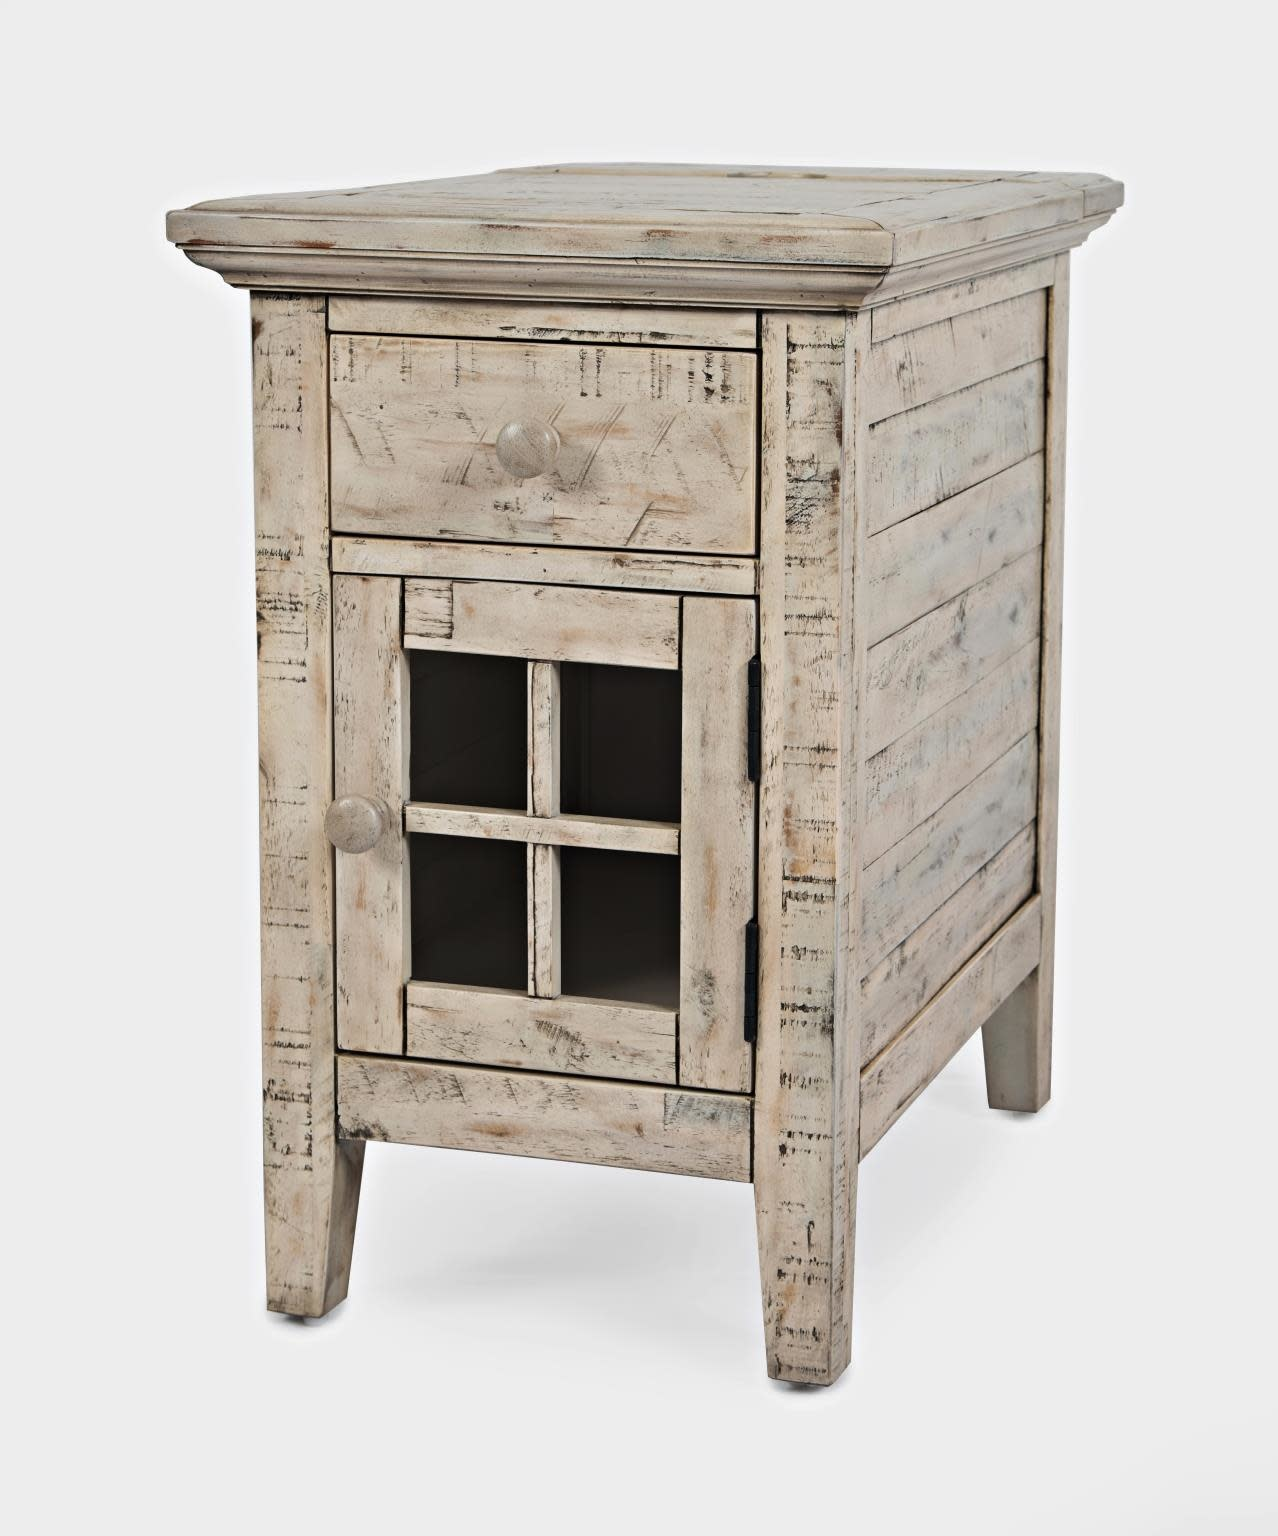 Jofran Rustic Shores Chairside Table Scrimshaw